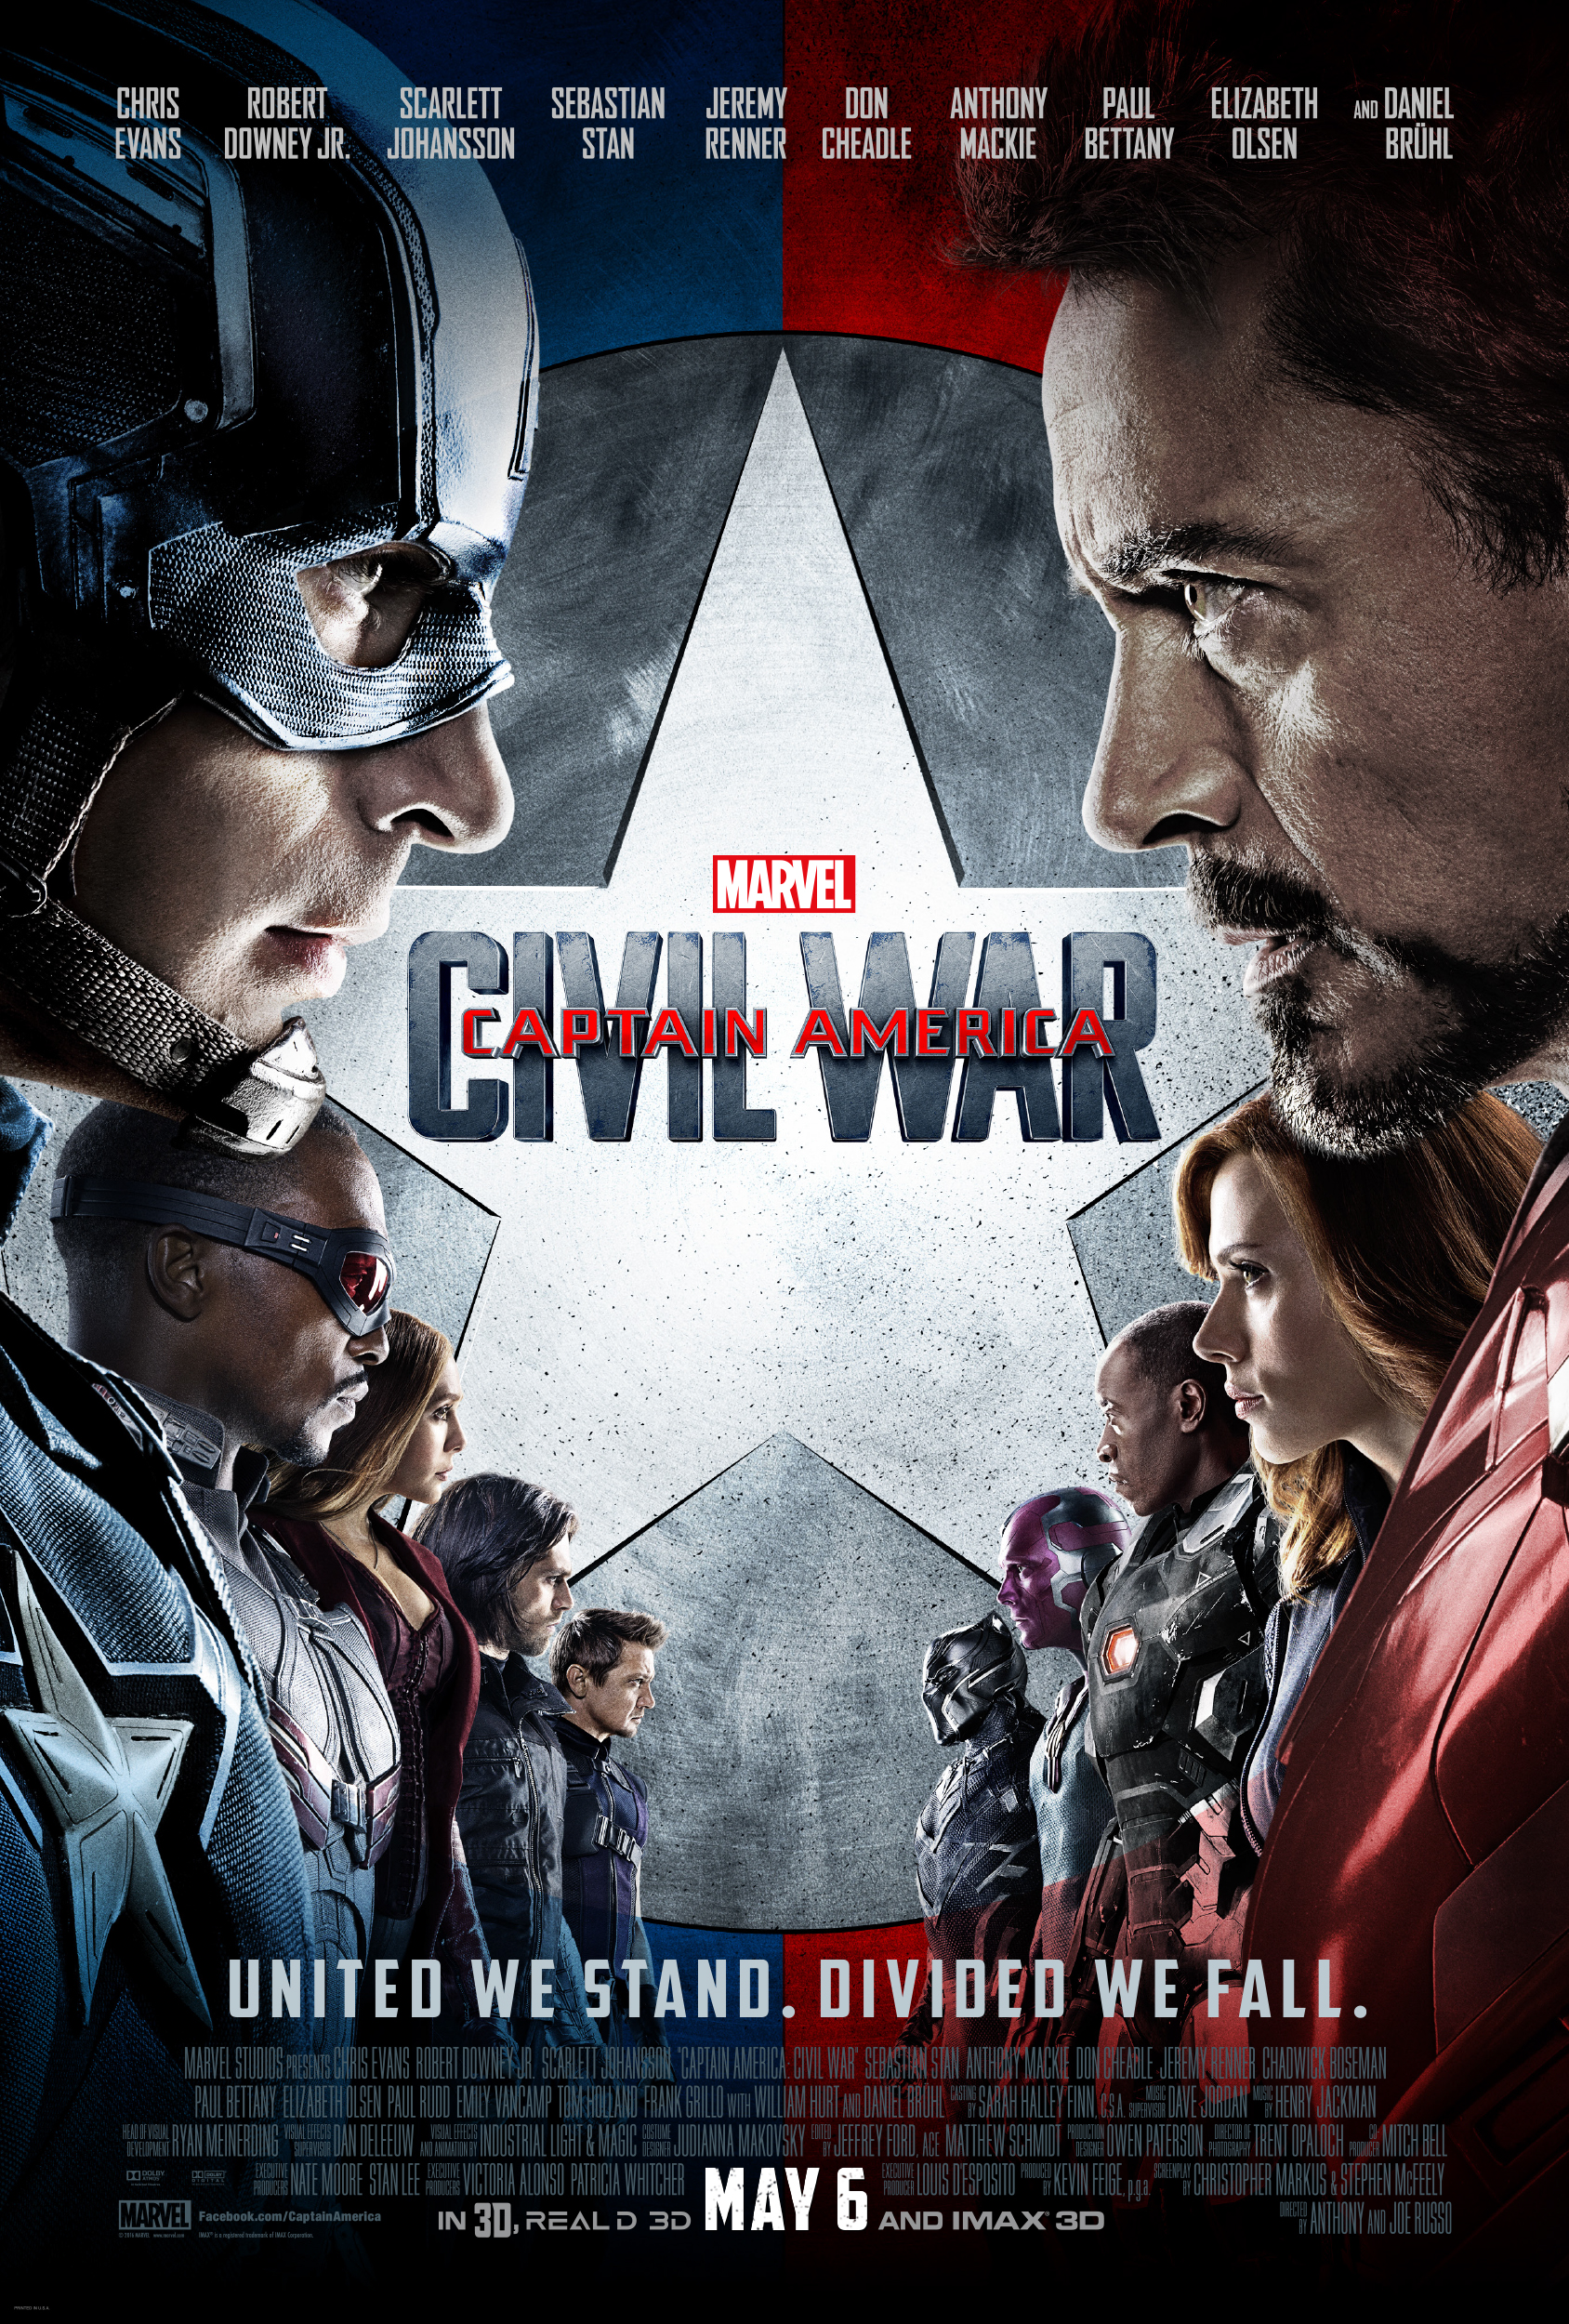 Marvel's Captain America: Civil War Poster and Trailer Are Here #CaptainAmericaCivilWar